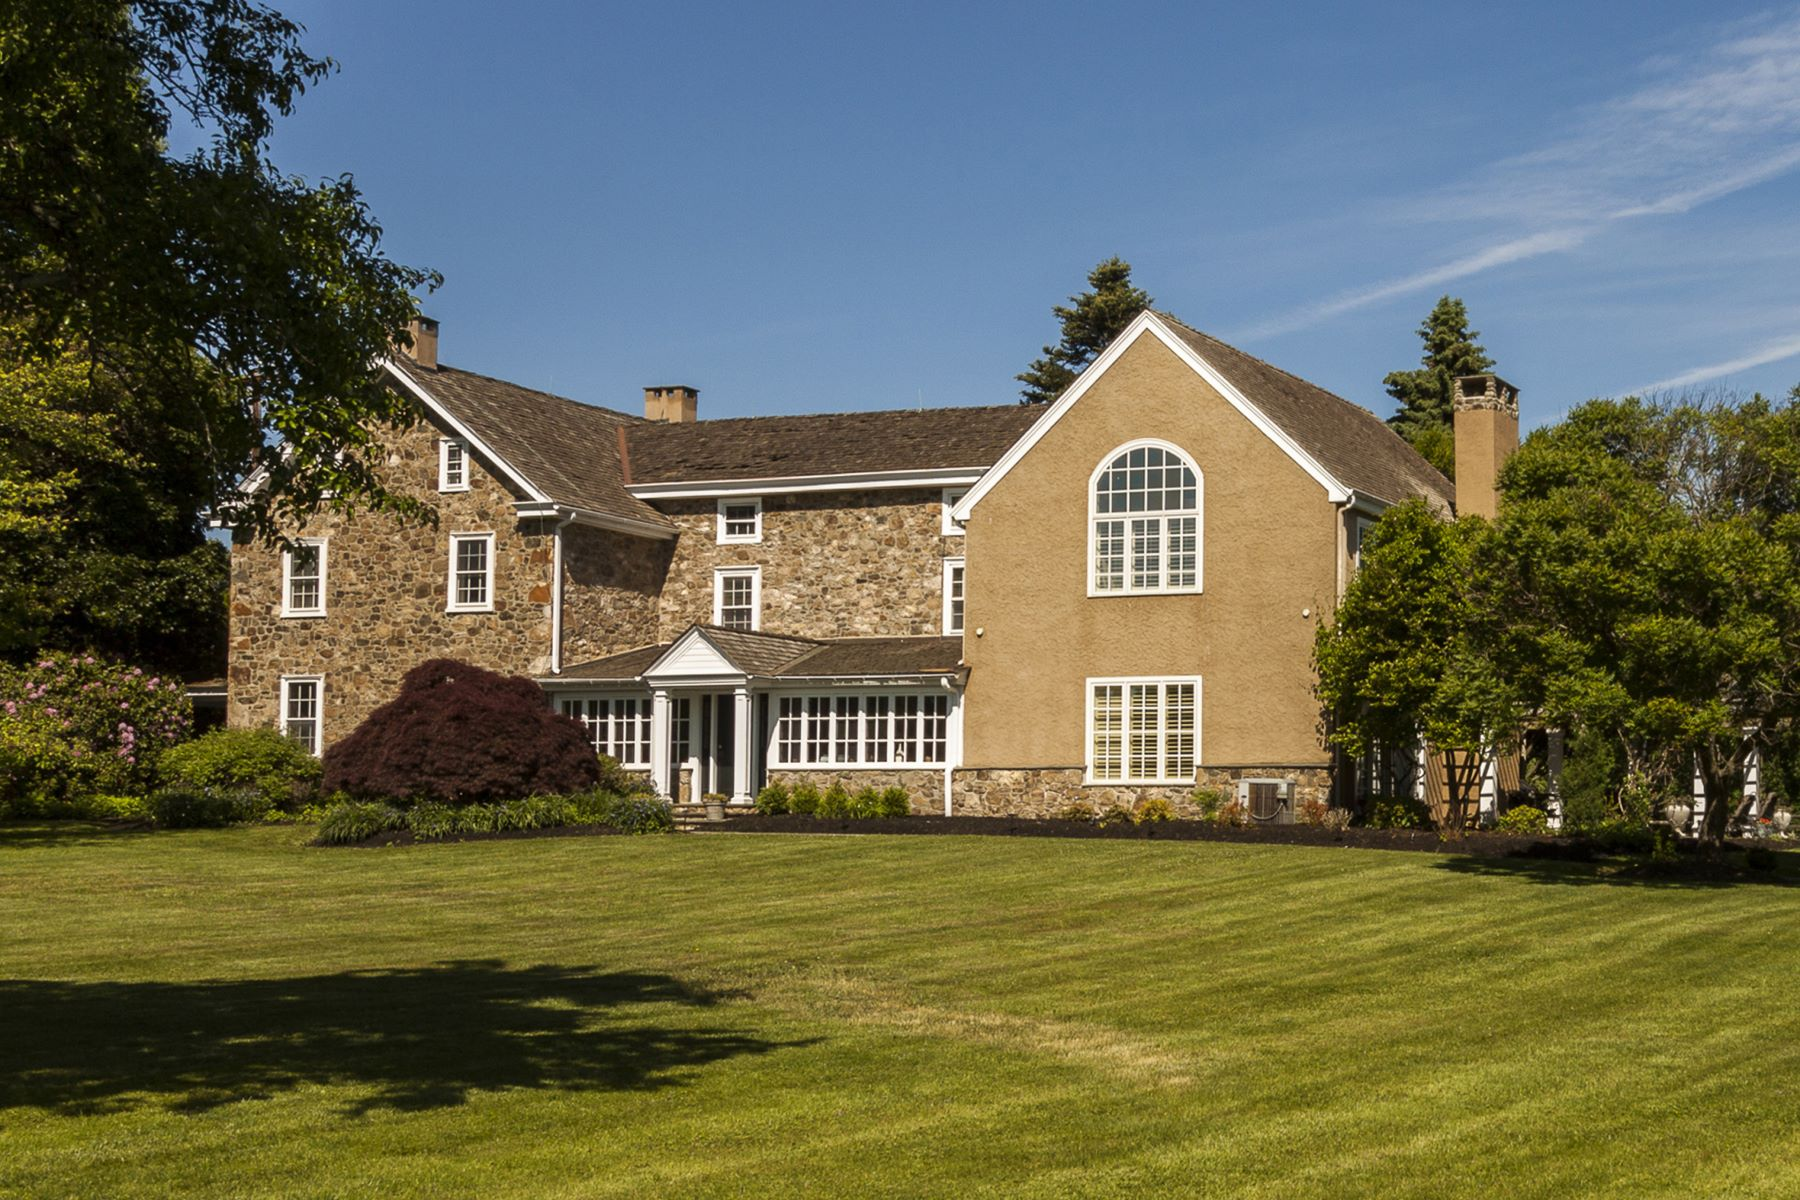 Farm / Ranch / Plantation for Sale at Three Ponds Farm 2336 PIKELAND RD Malvern, Pennsylvania 19355 United States